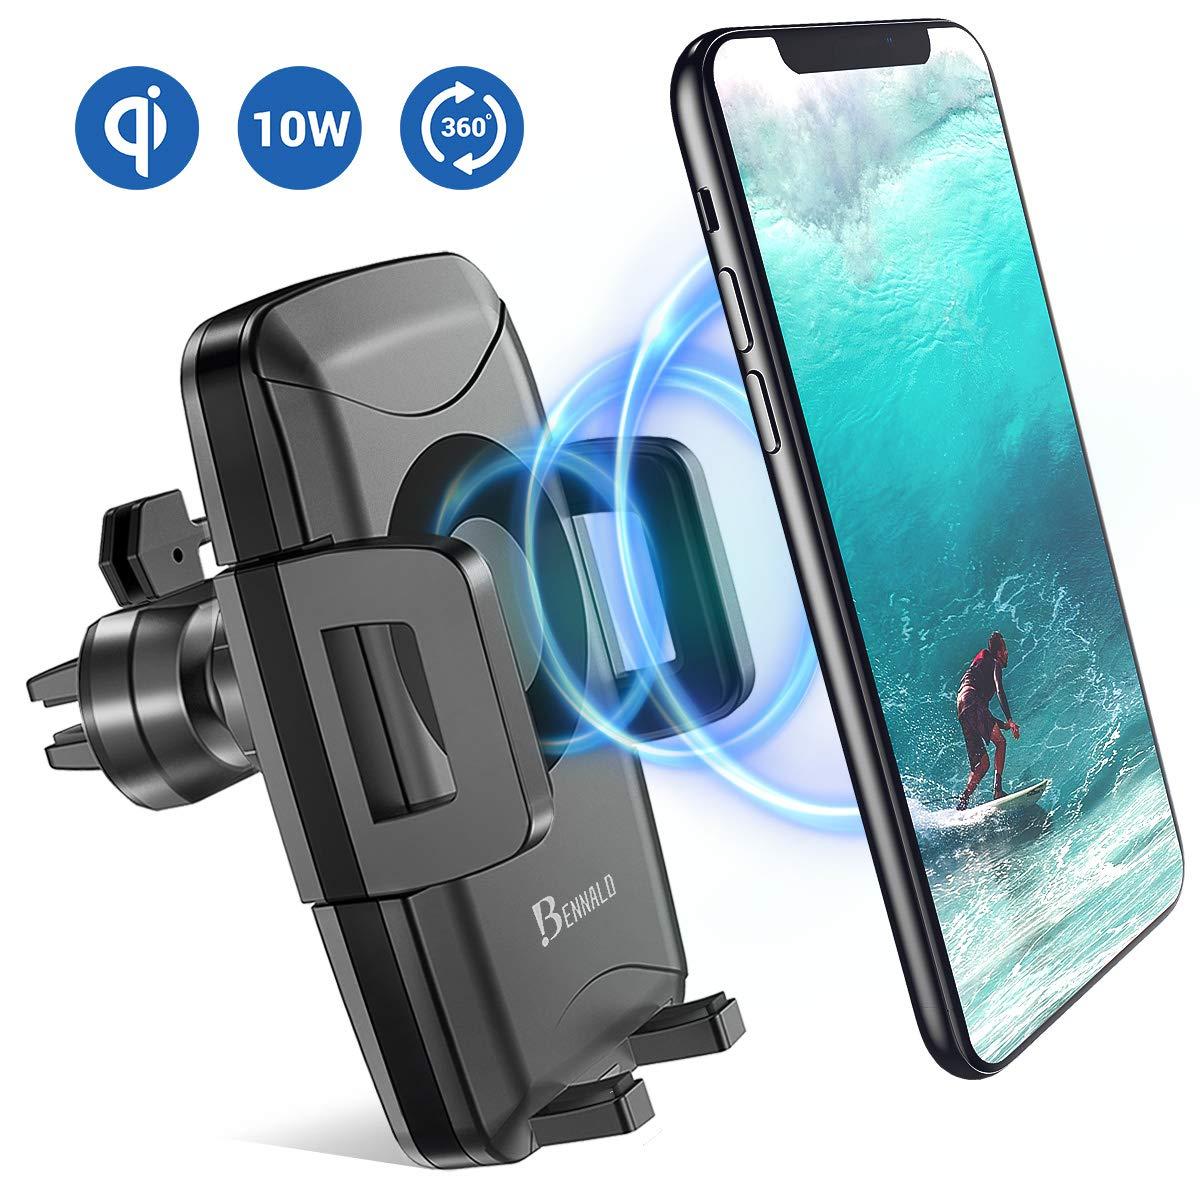 BENNALD Handyhalter fü rs Auto, Wireless Charger Auto Handyhalterung Auto Lü ftung Induktive Qi Ladegerä t 10W Charger fü r iPhone XS/XS Max/Xr/X/8/8Plus, Samsung Galaxy Note 5/8/9/S9/S9+/S8/S8+ DL-AUTO-CHARGER-AVT